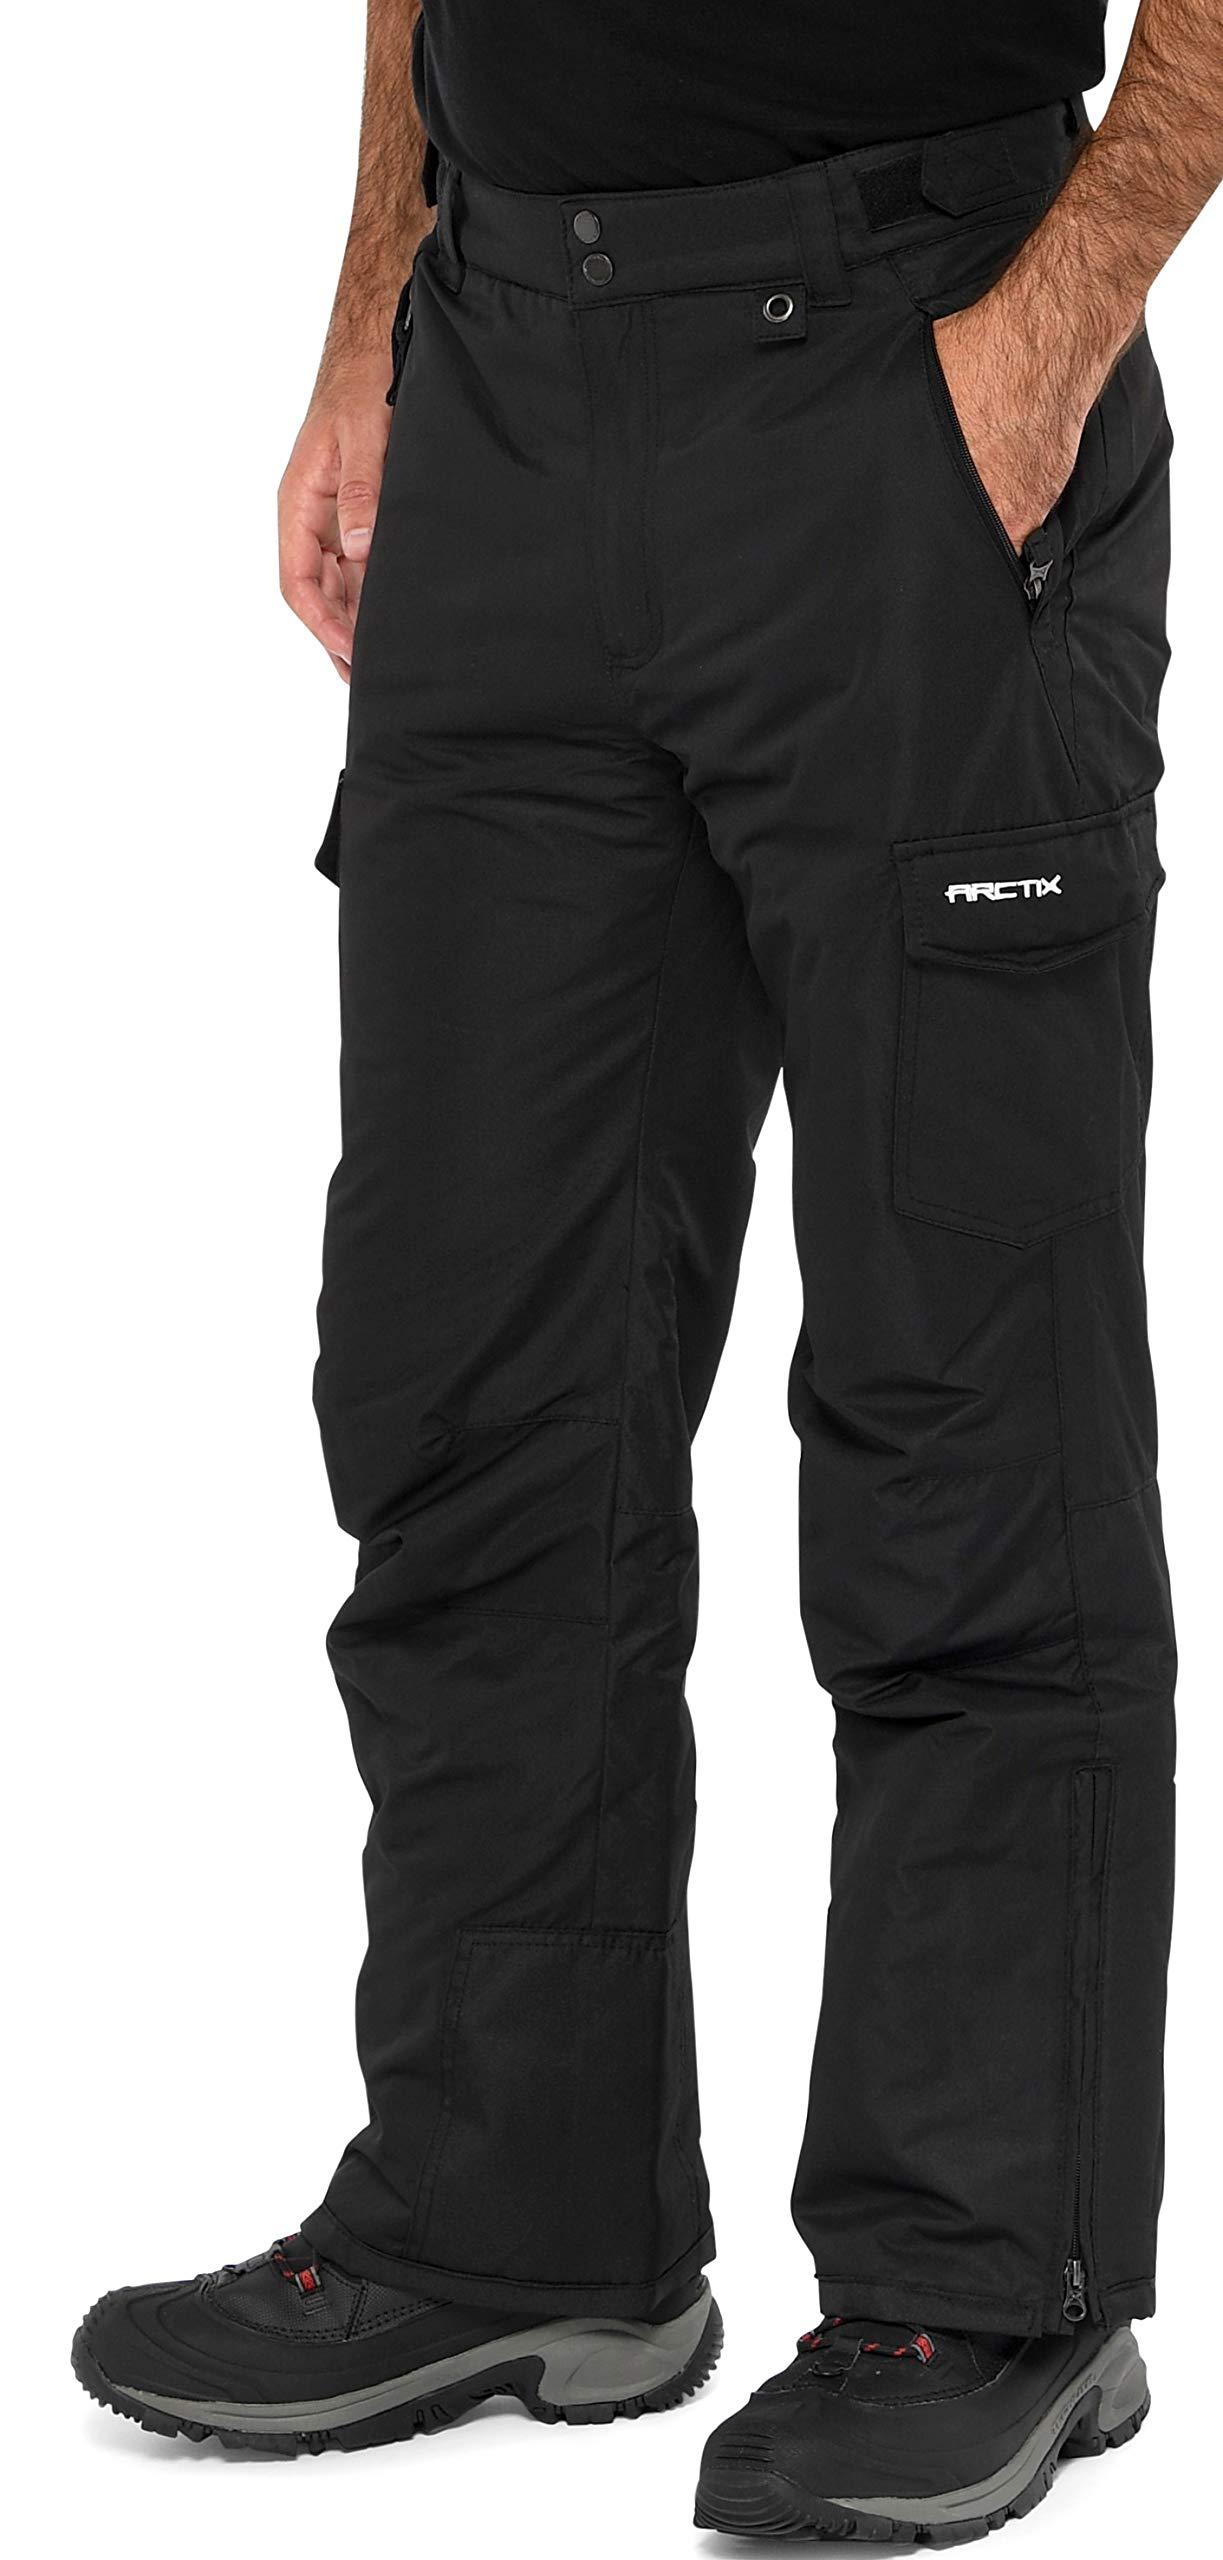 Arctix Men's Snow Sports Cargo Pants, Black, 4X-Large/36'' Inseam by Arctix